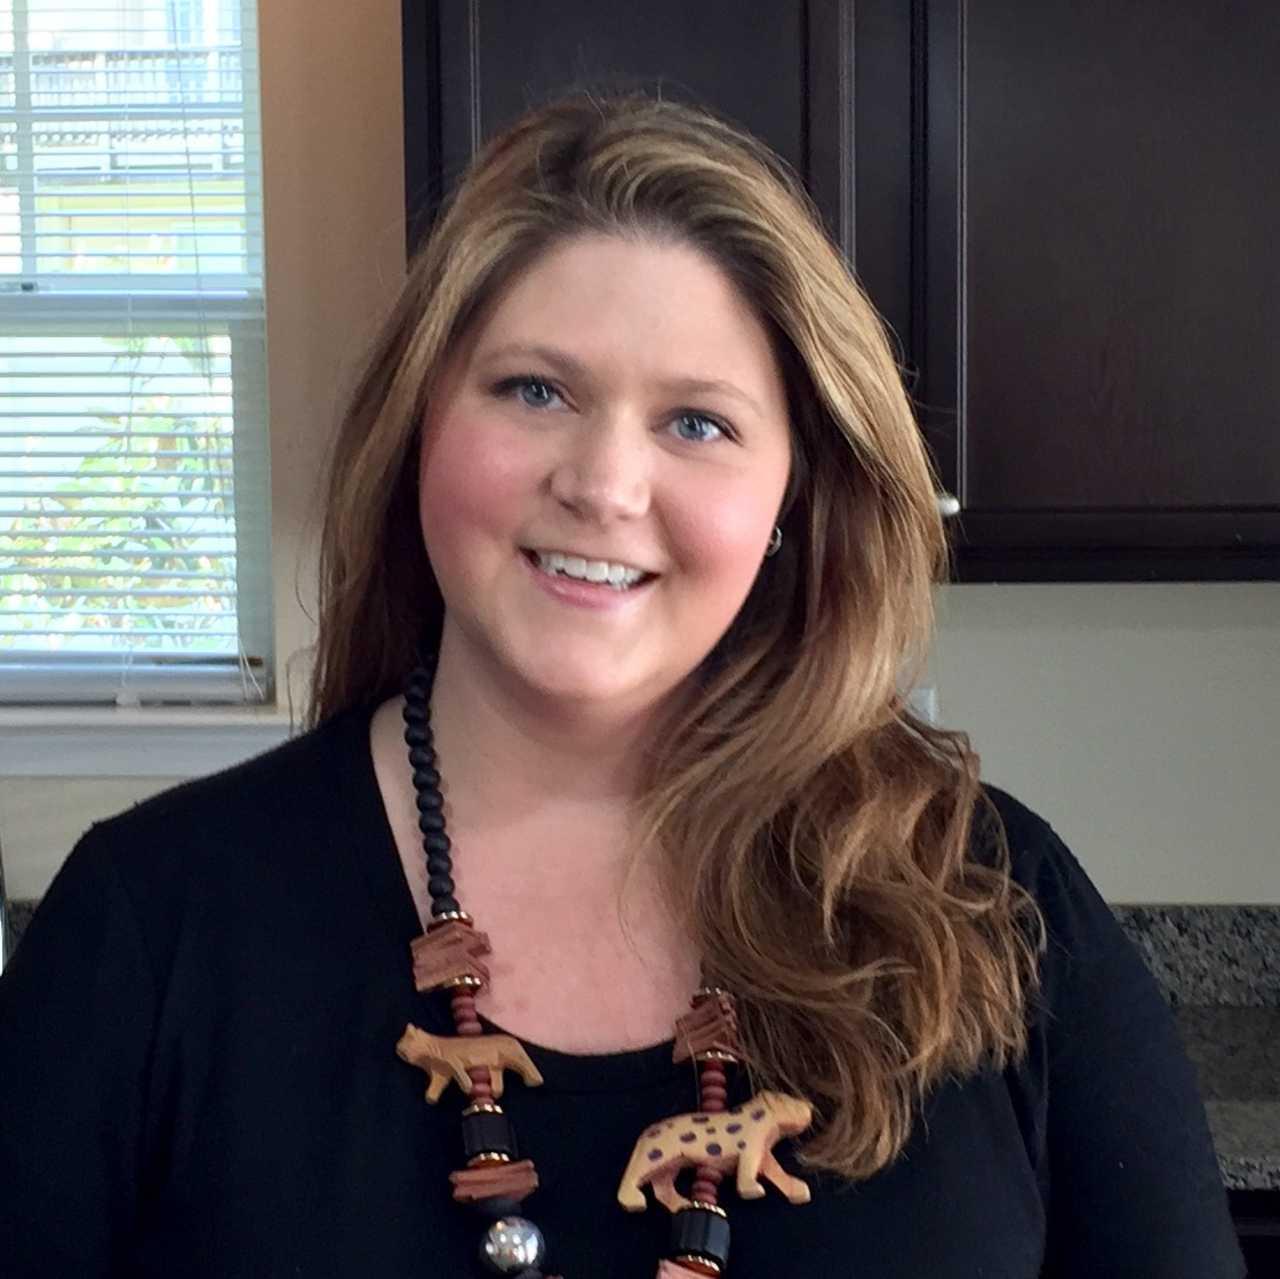 Dalton Realty- Ruth Jones - Real Estate - Real Estate Agents in Virginia Beach VA